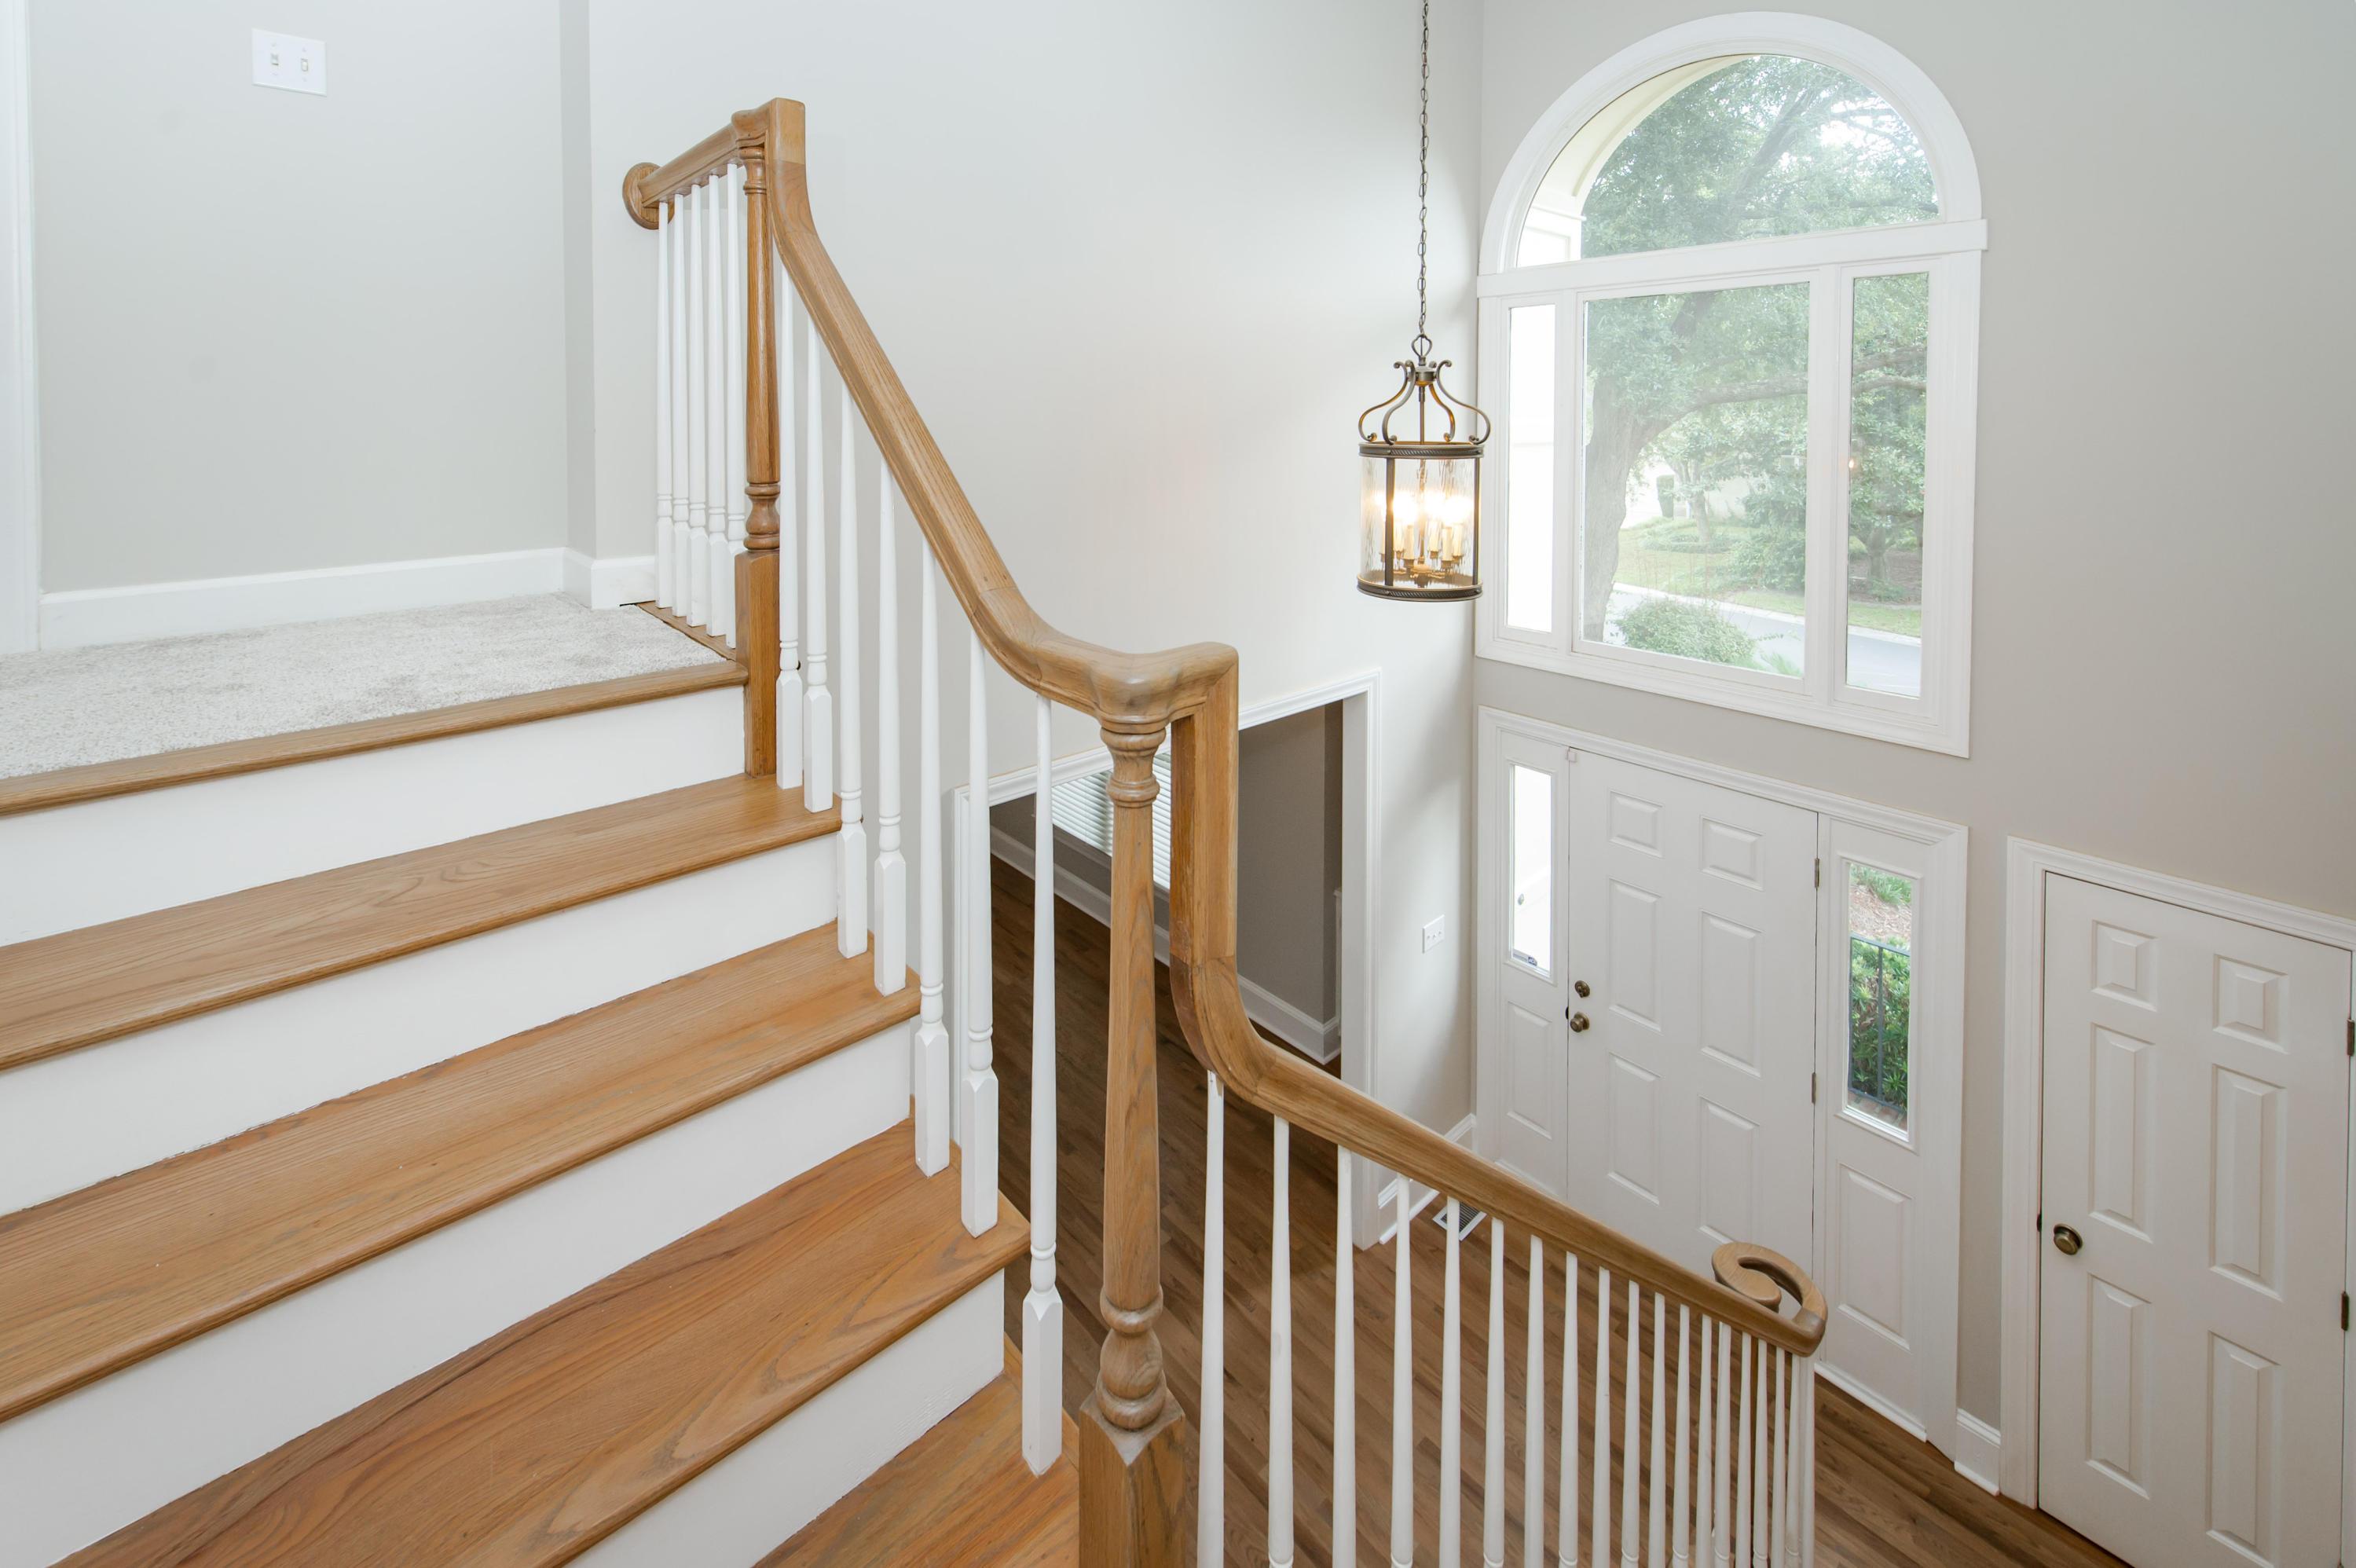 Hobcaw Creek Plantation Homes For Sale - 670 Palisades, Mount Pleasant, SC - 15